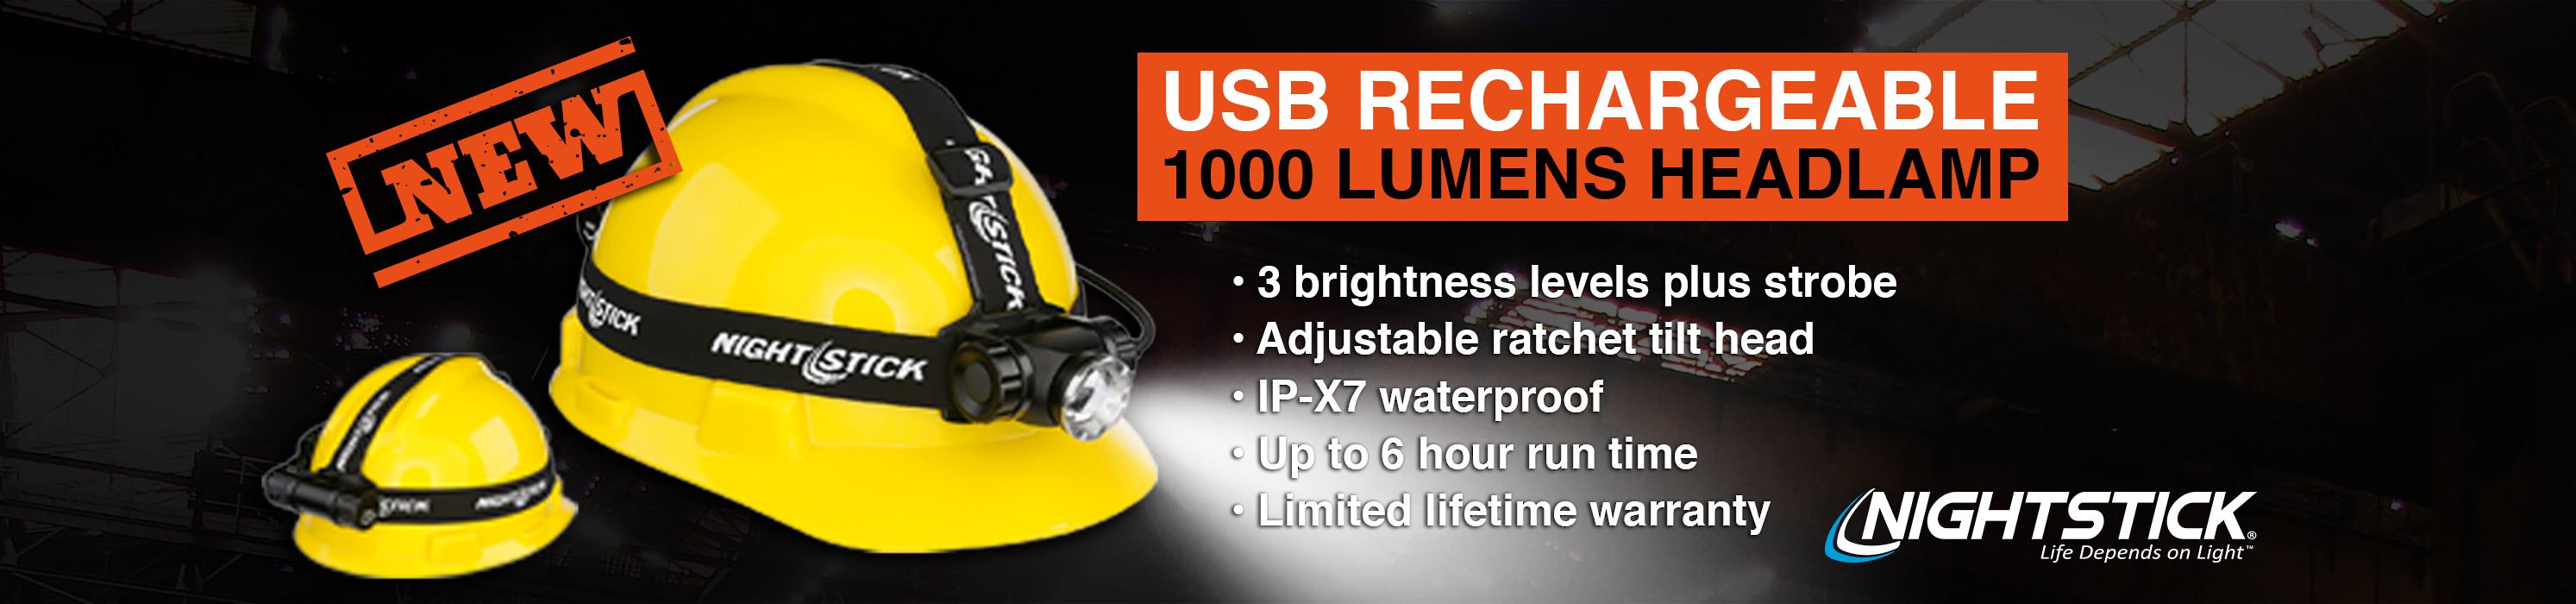 Really Bright 1000 Lumen USB rechargeable Nightstick headlamp